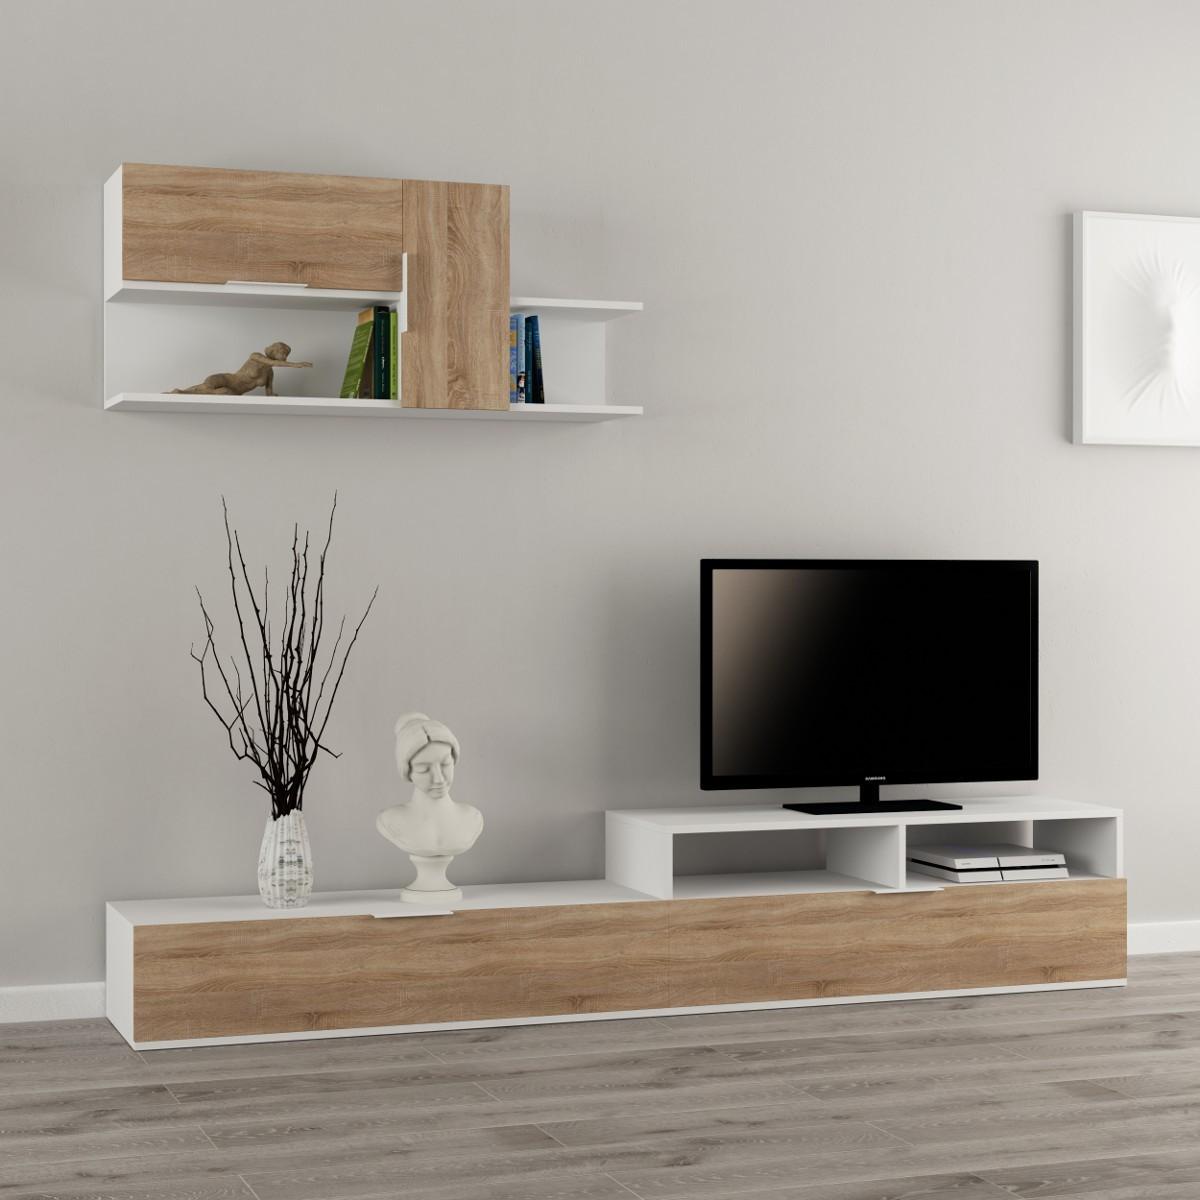 Adair parete attrezzata in legno melaminico design moderno for Parete attrezzata design moderno